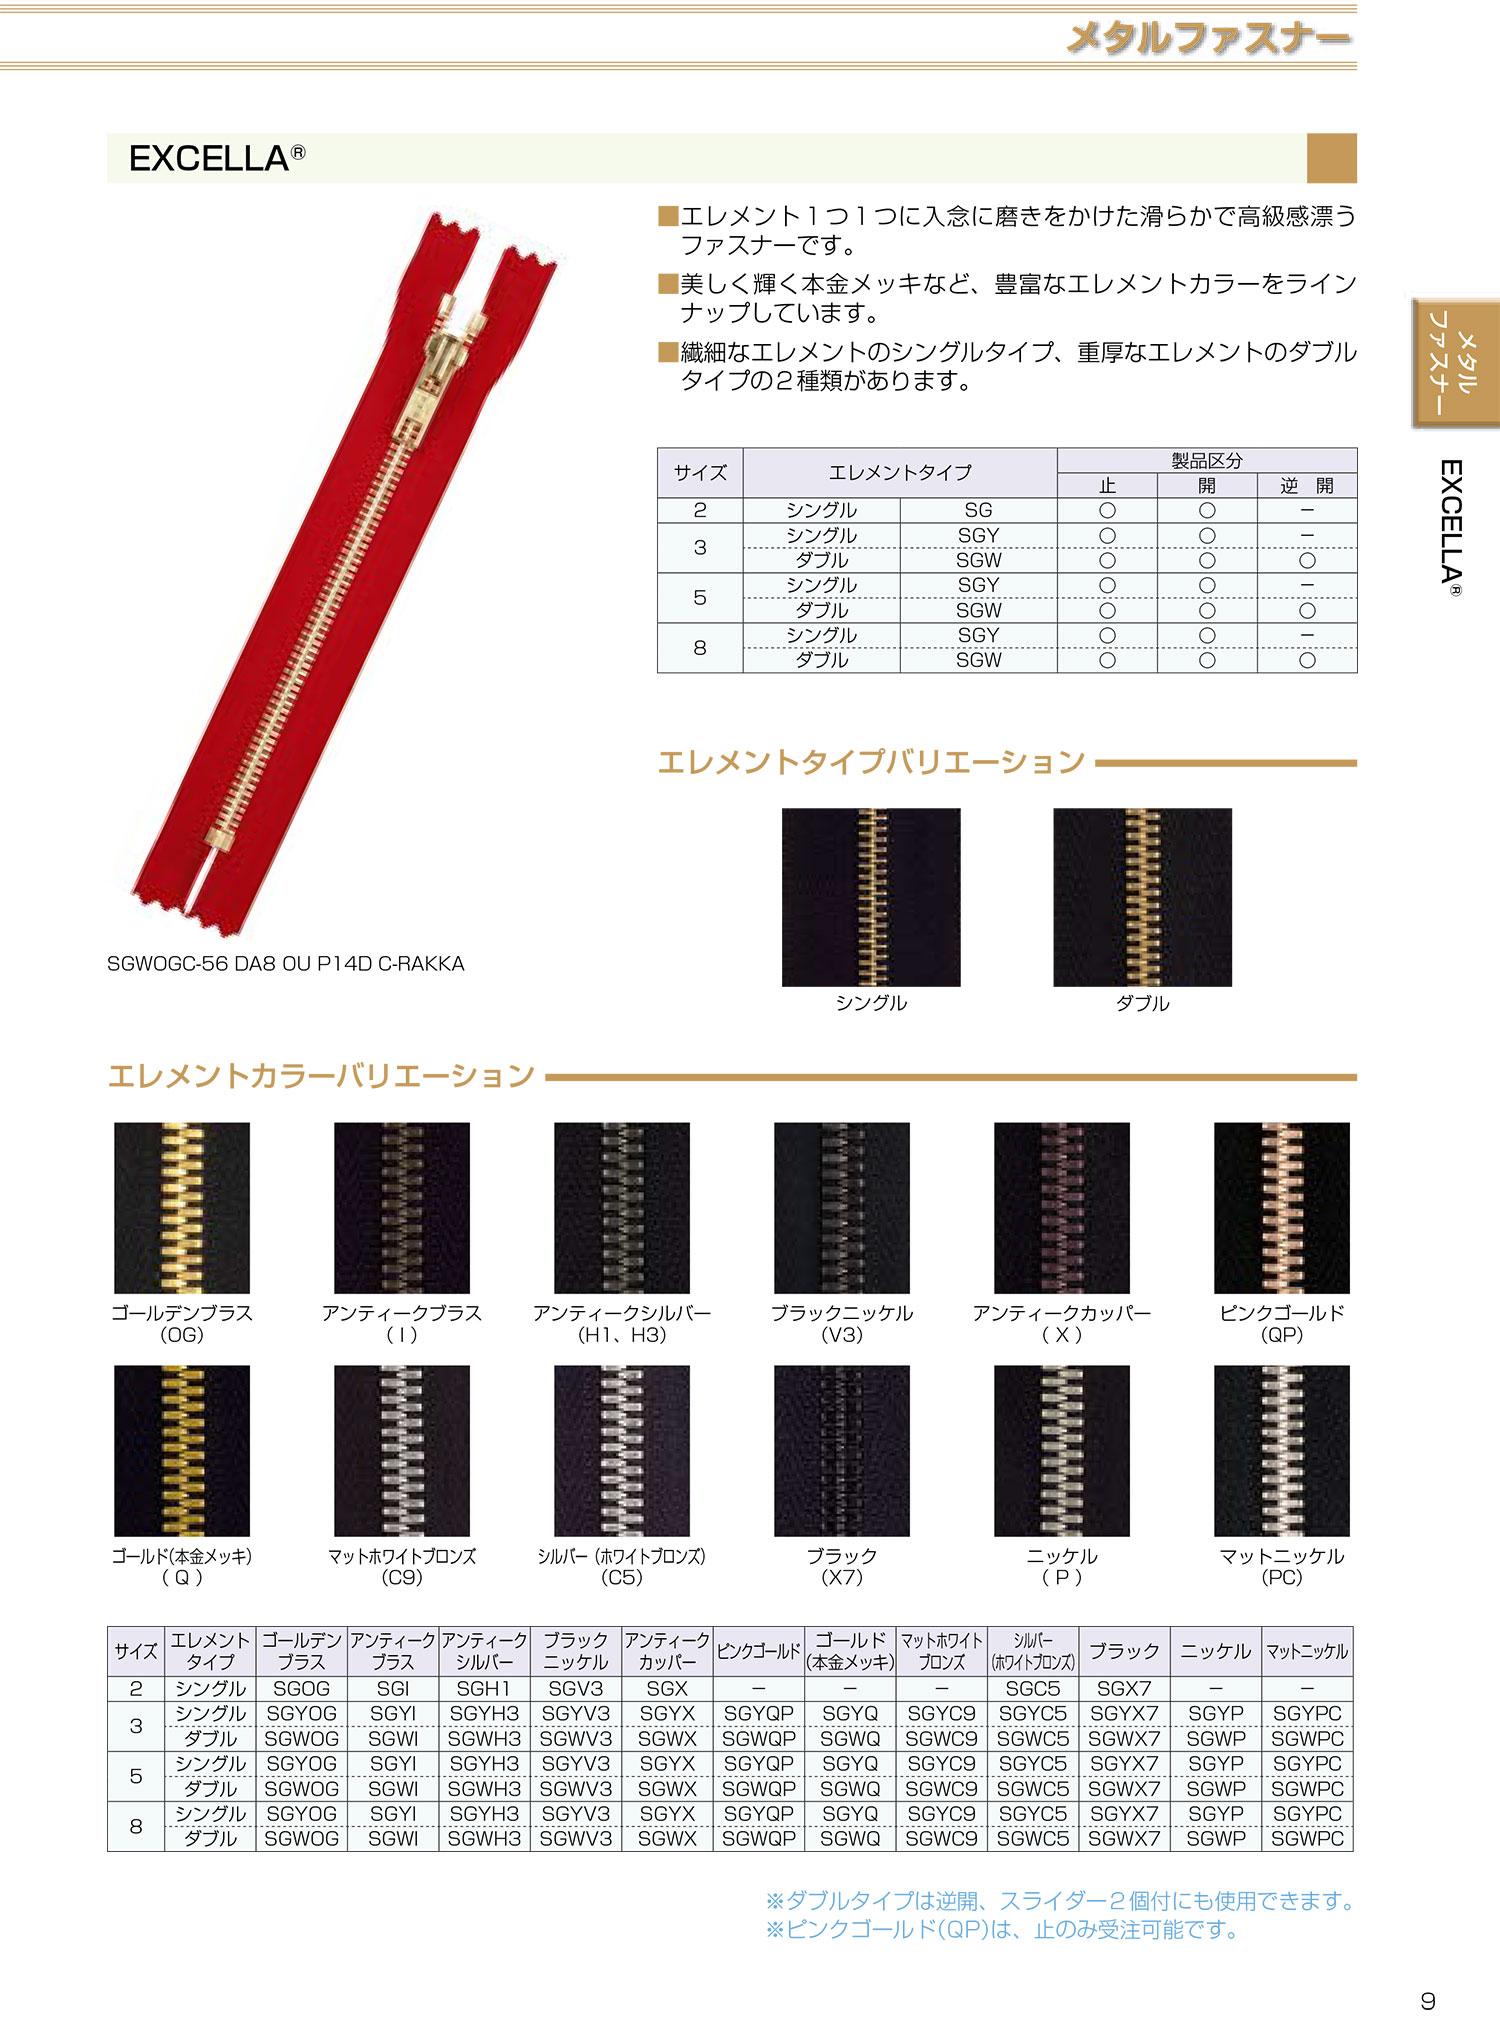 3SGWX7MR エクセラ 3サイズ ブラック 逆開 ダブル[ファスナー] YKK/オークラ商事 - ApparelX アパレル資材卸通販